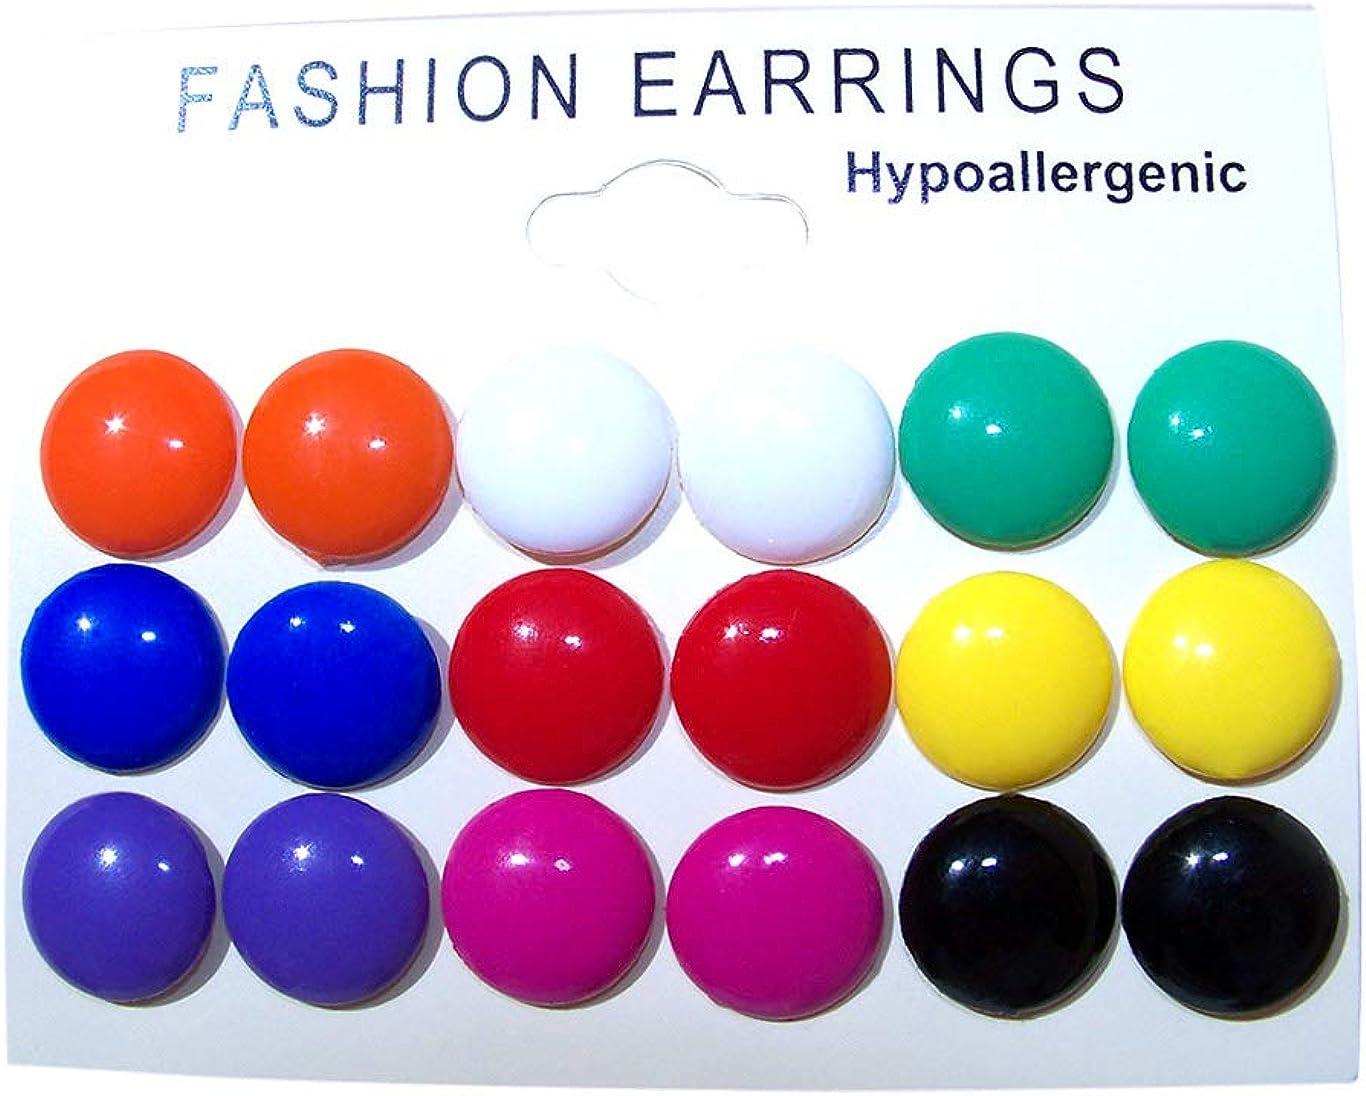 Novelty Pink Disc Themed Plastic Stud Earrings Pierced Ears Brand NEW